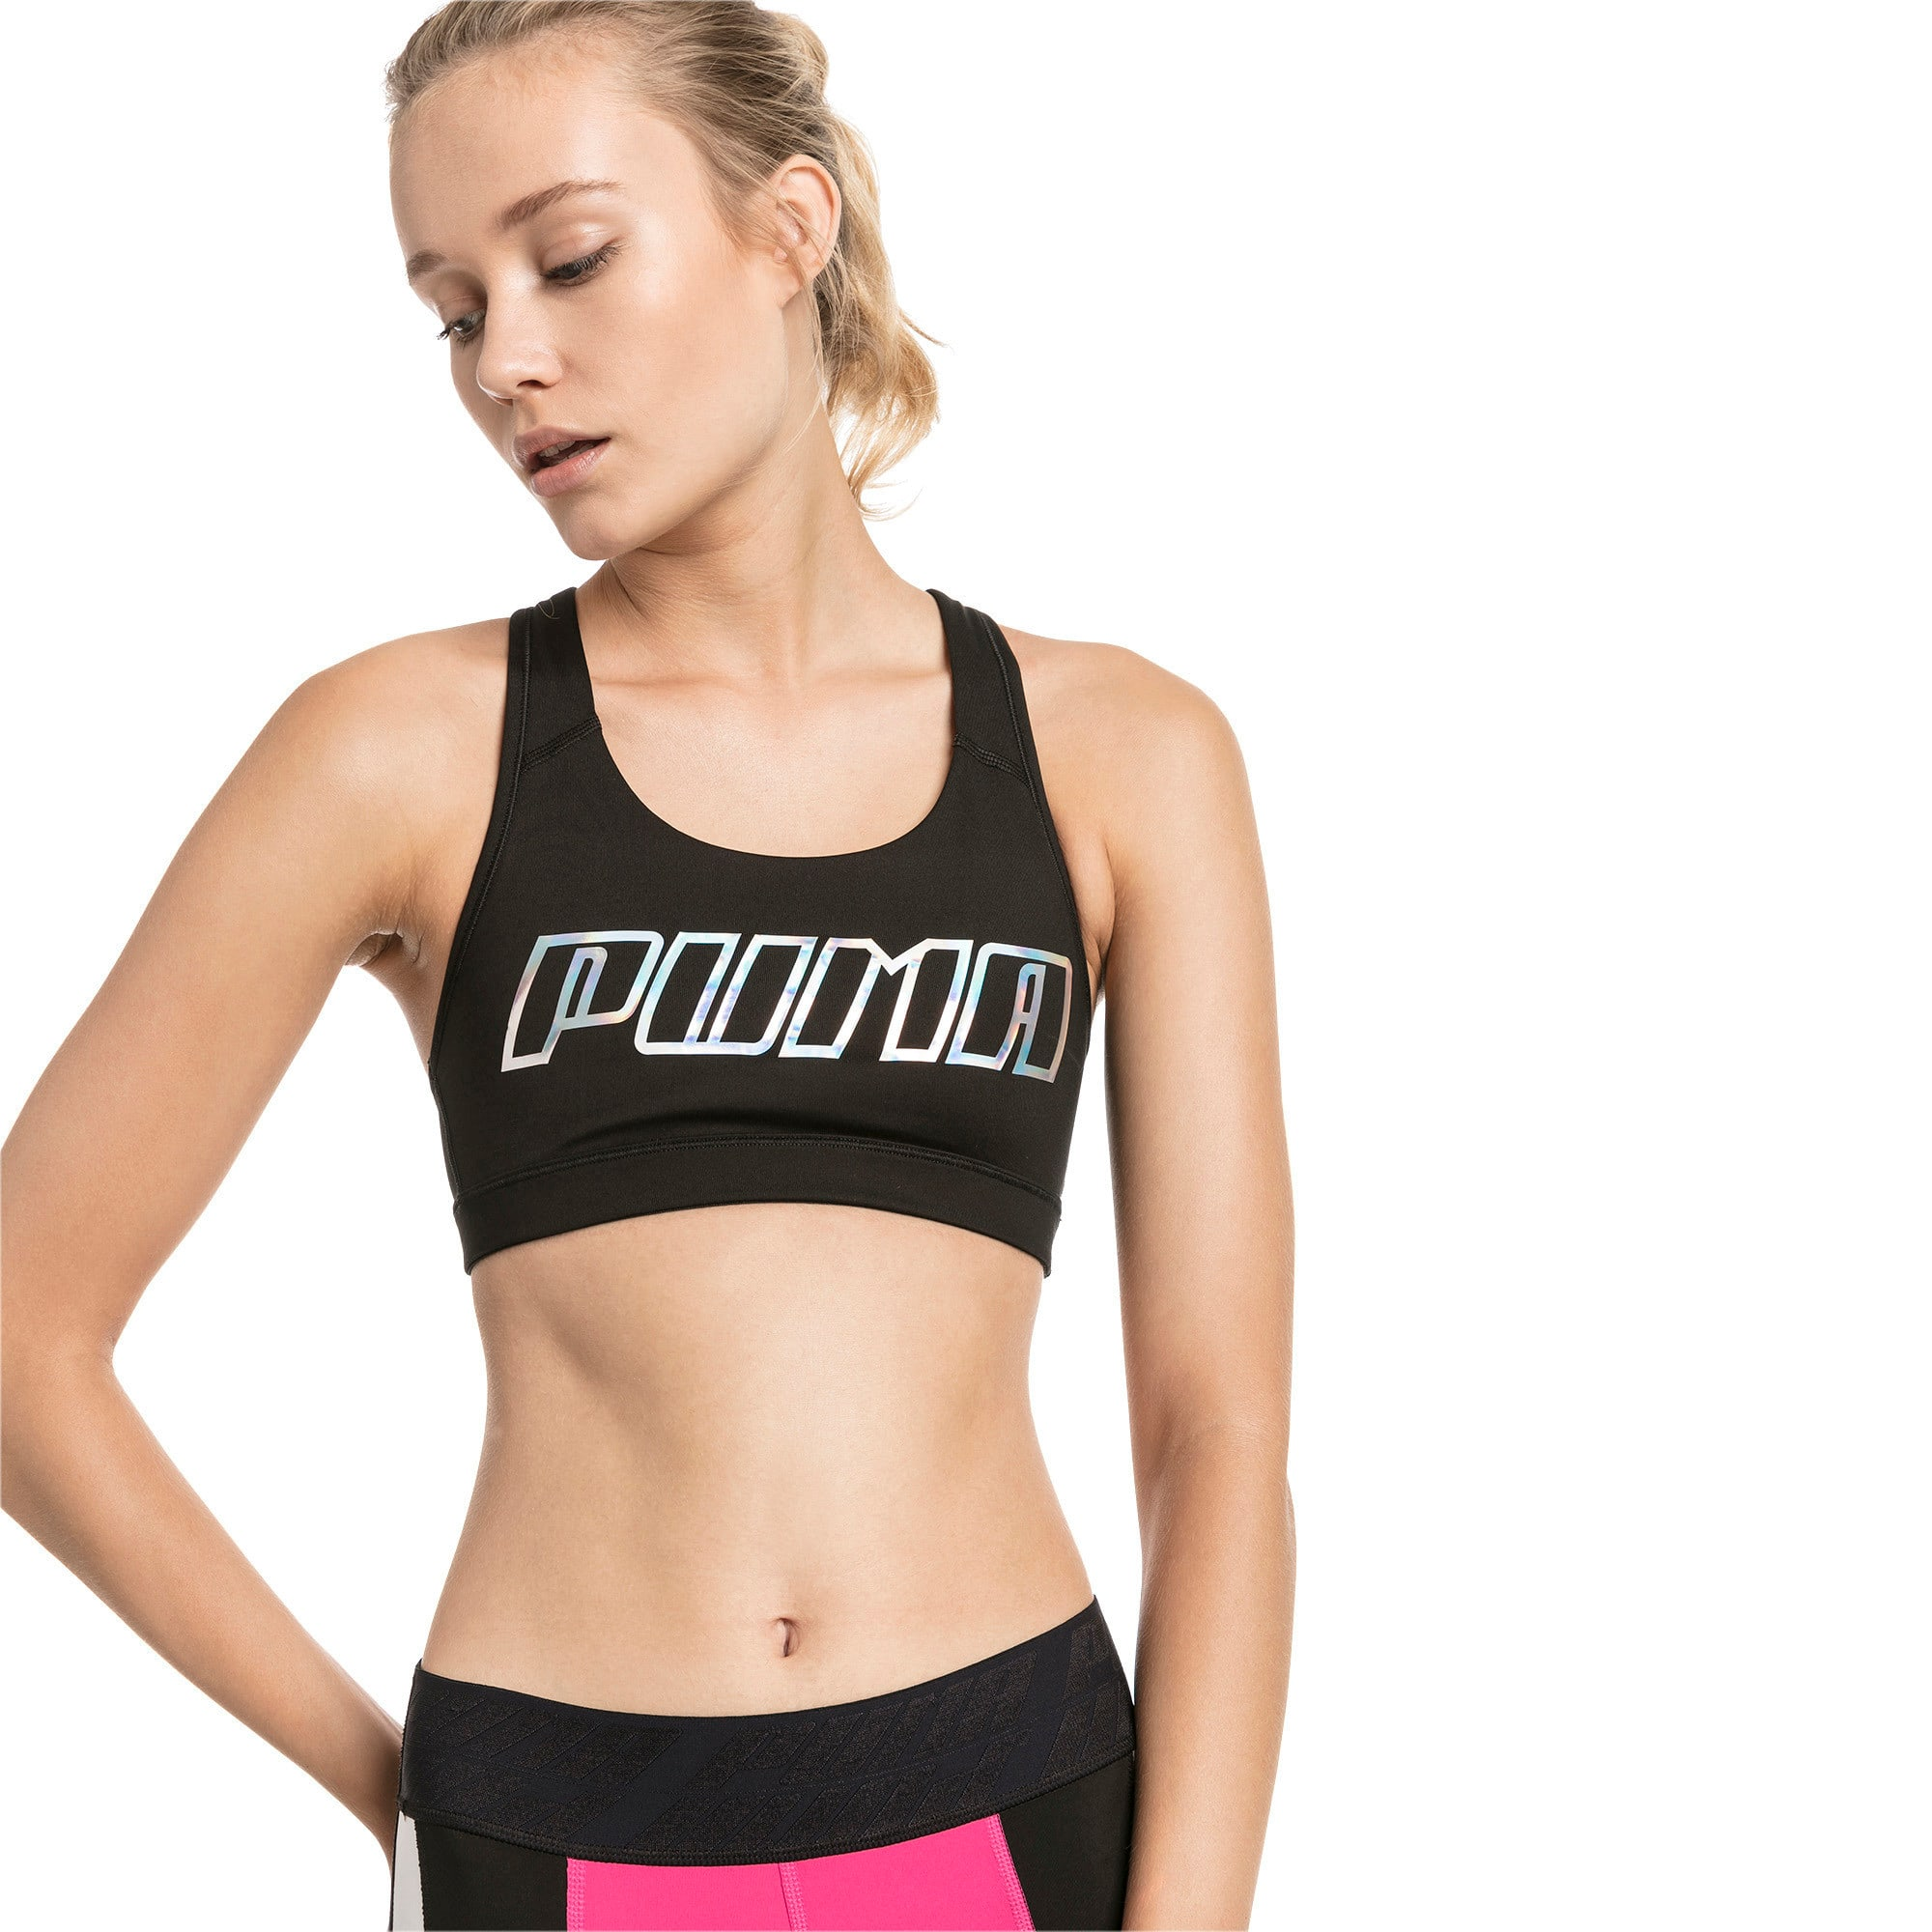 4Keeps Women's Mid Impact Bra | Bra tops, Bra, Black puma